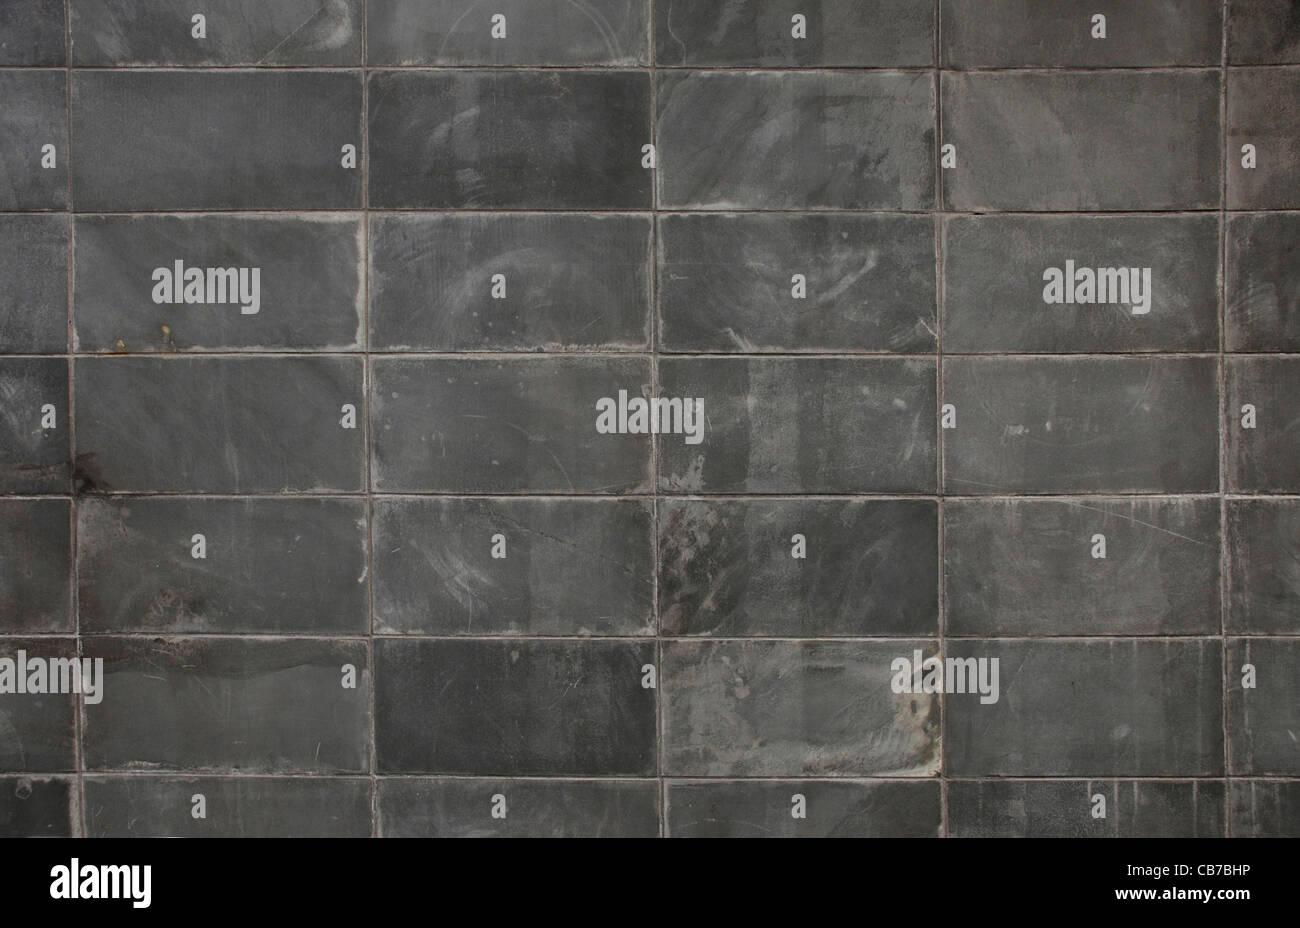 Dark gray block wall texture surface background - Stock Image